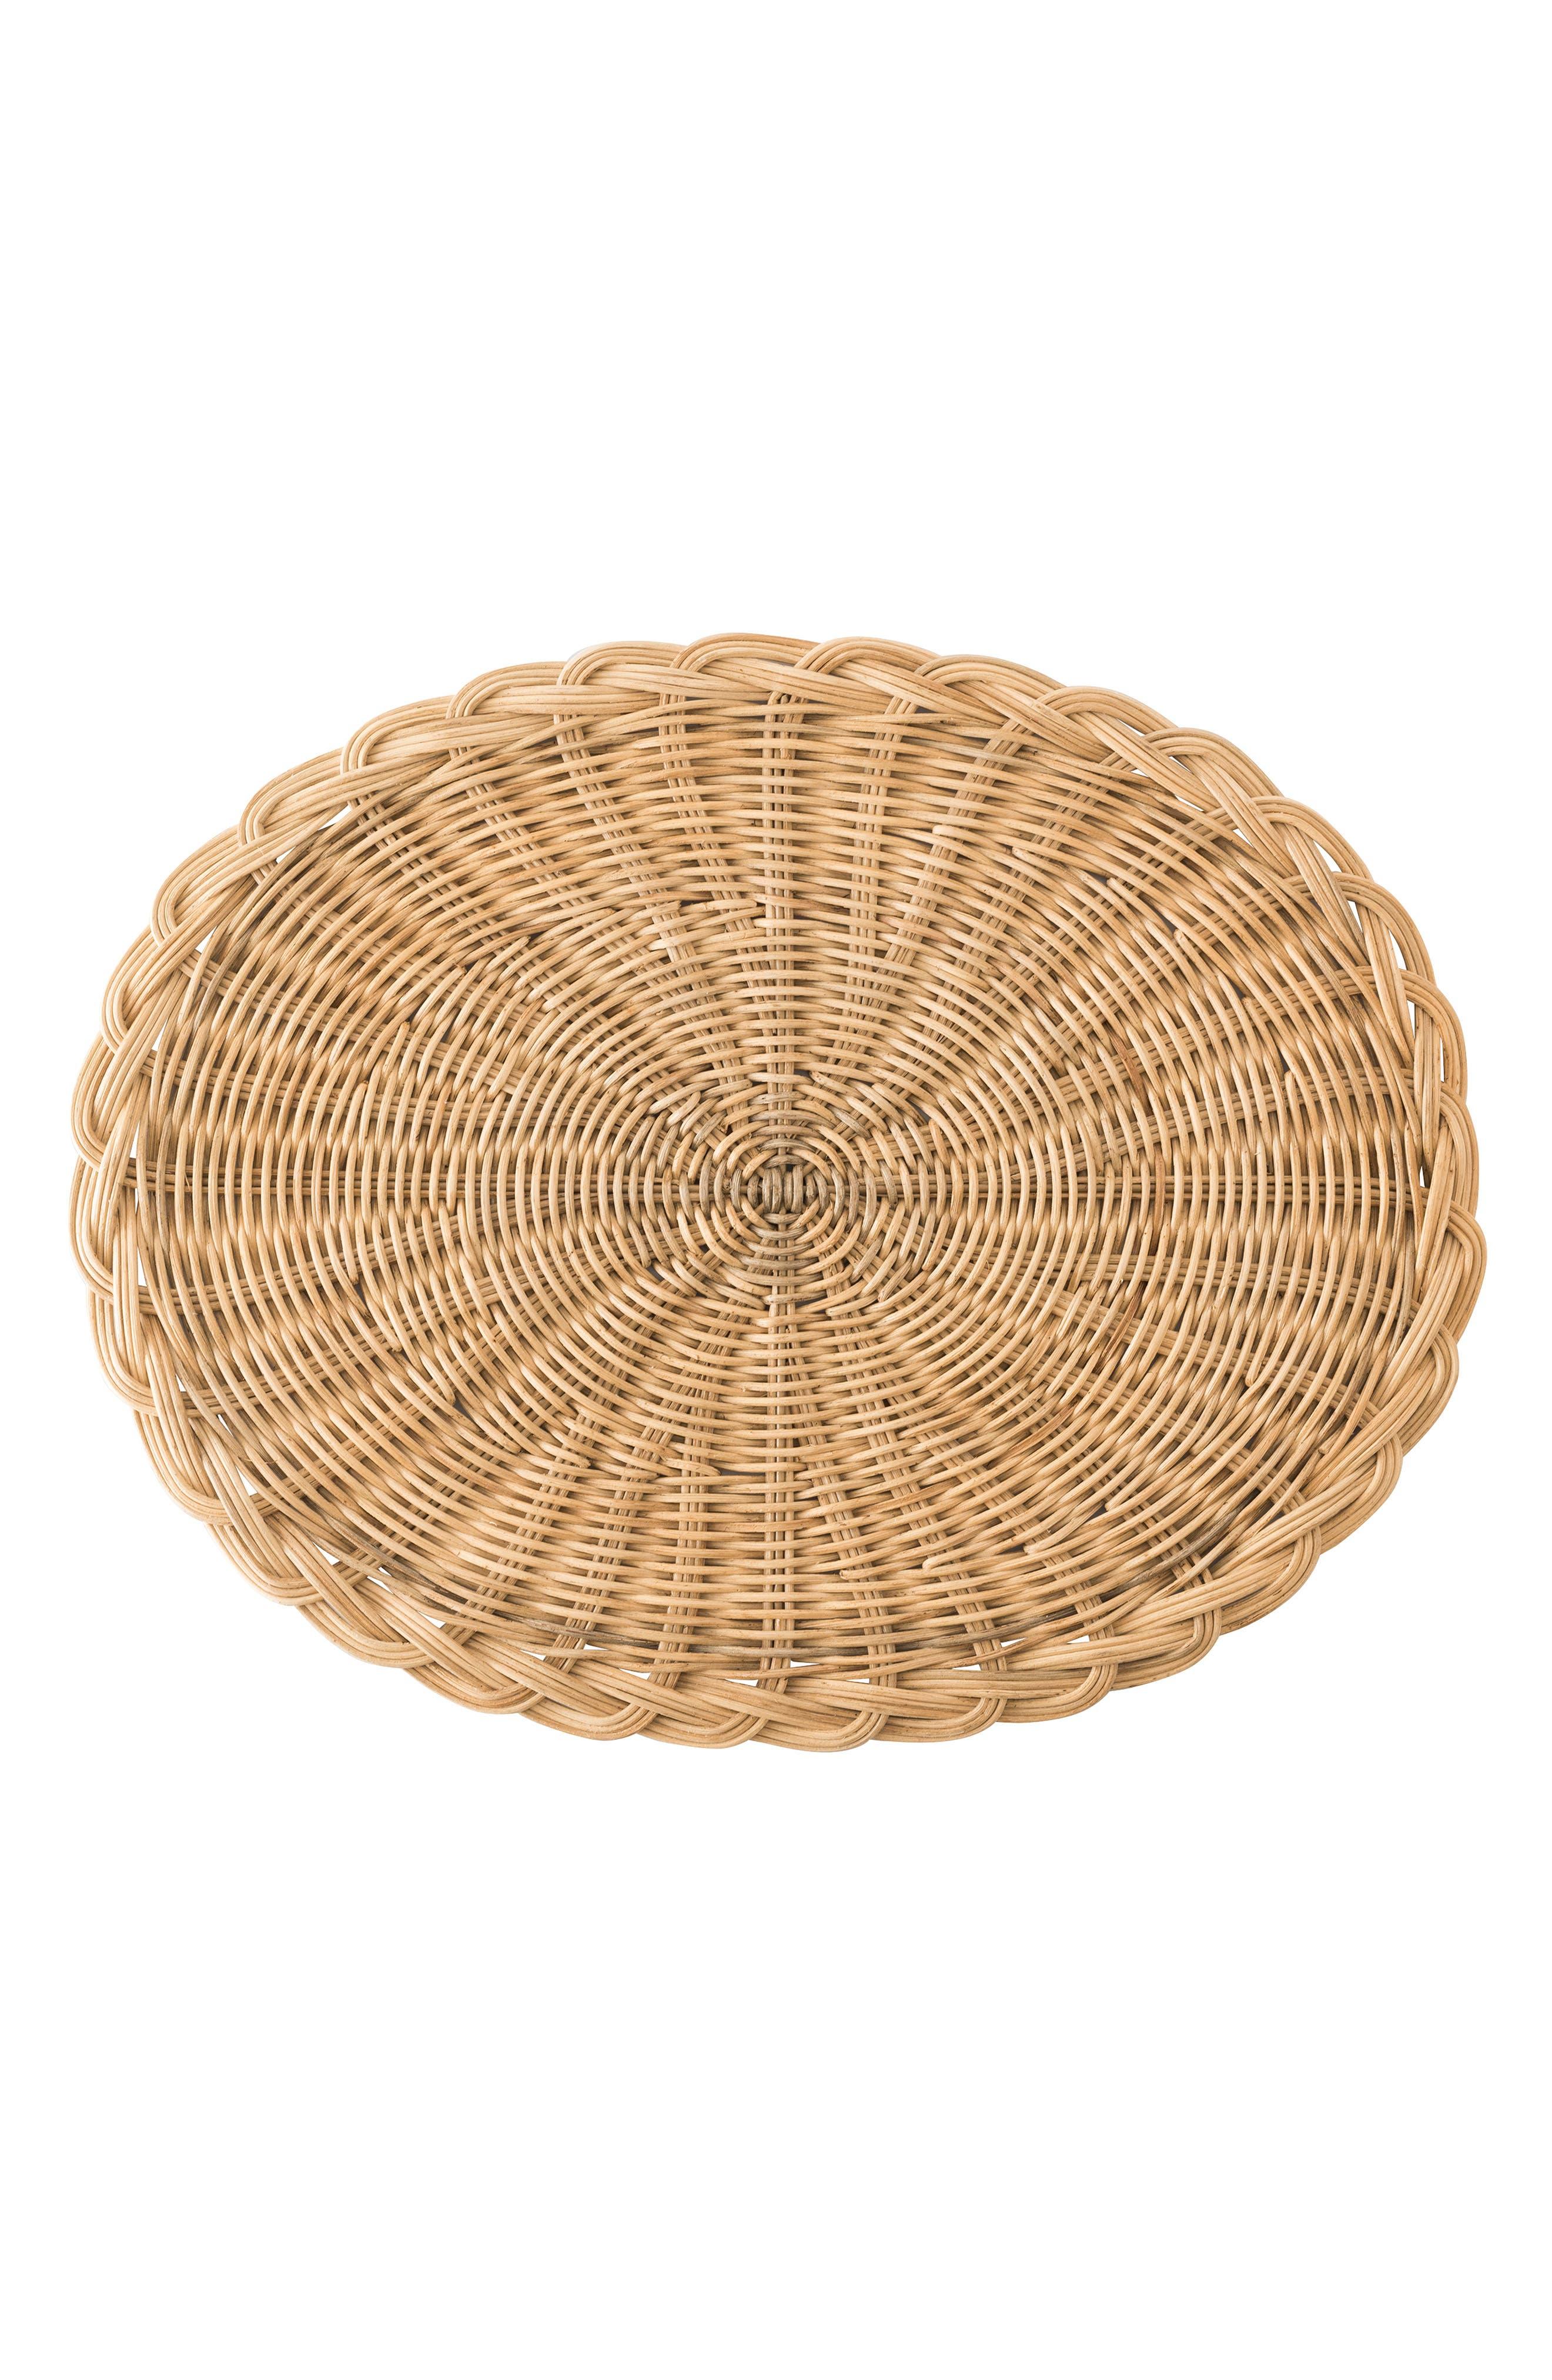 Juliska Braided Basket Placemat Size One Size  Beige